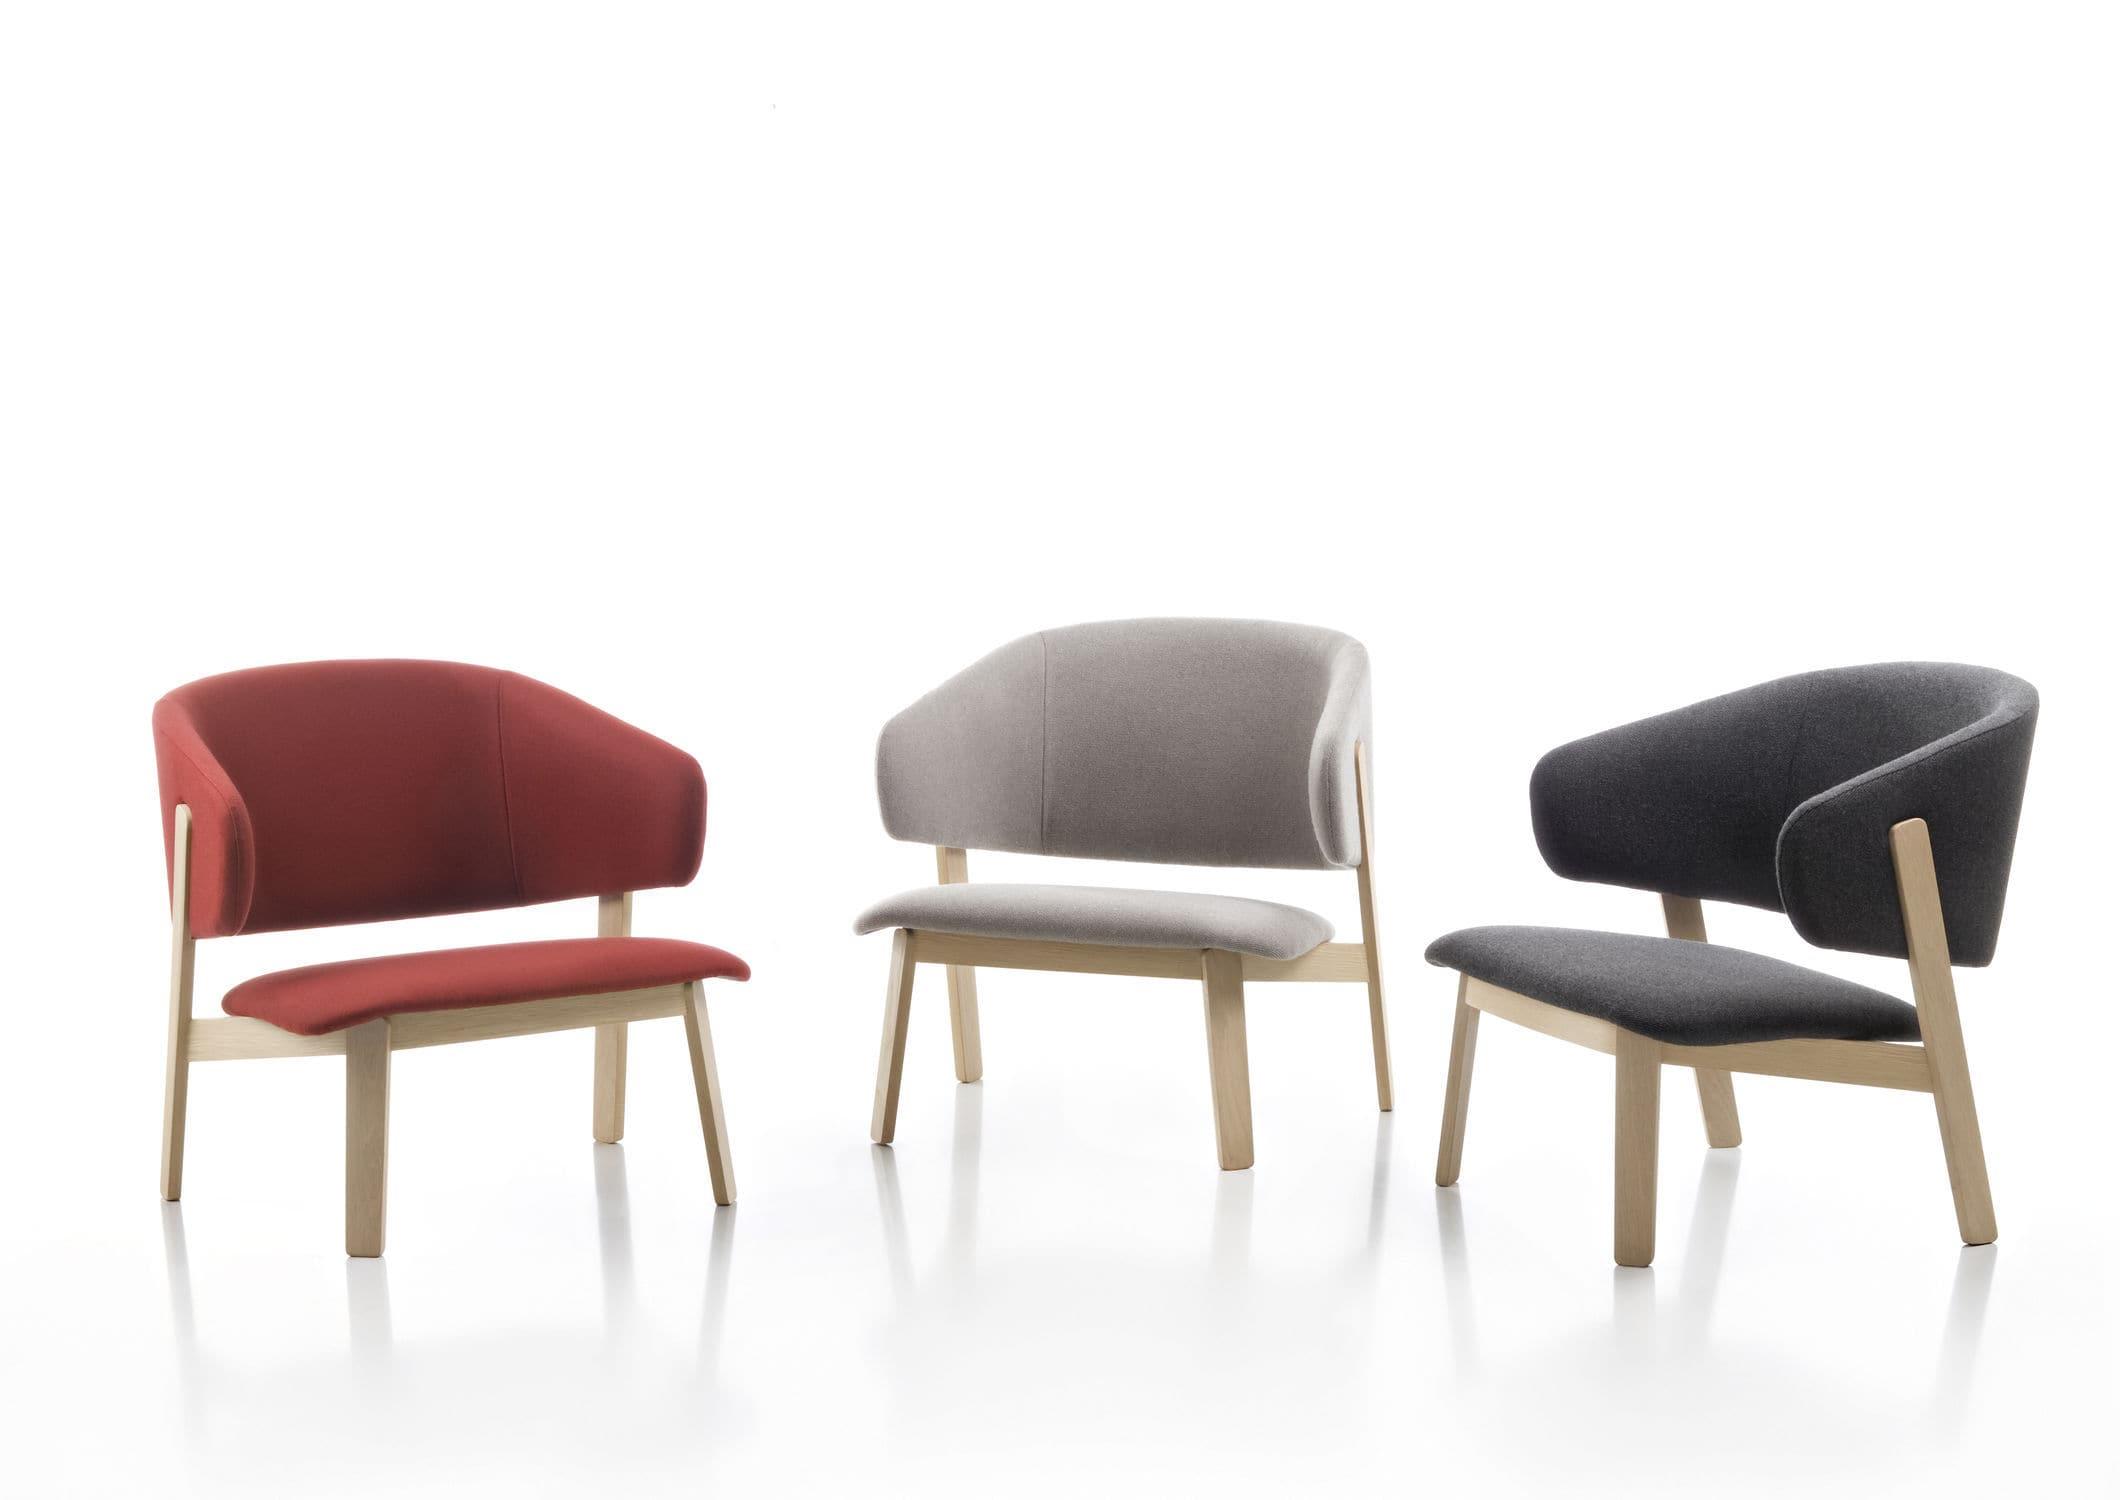 ... Scandinavian Design Armchair / Wooden / Fabric / Leather ...